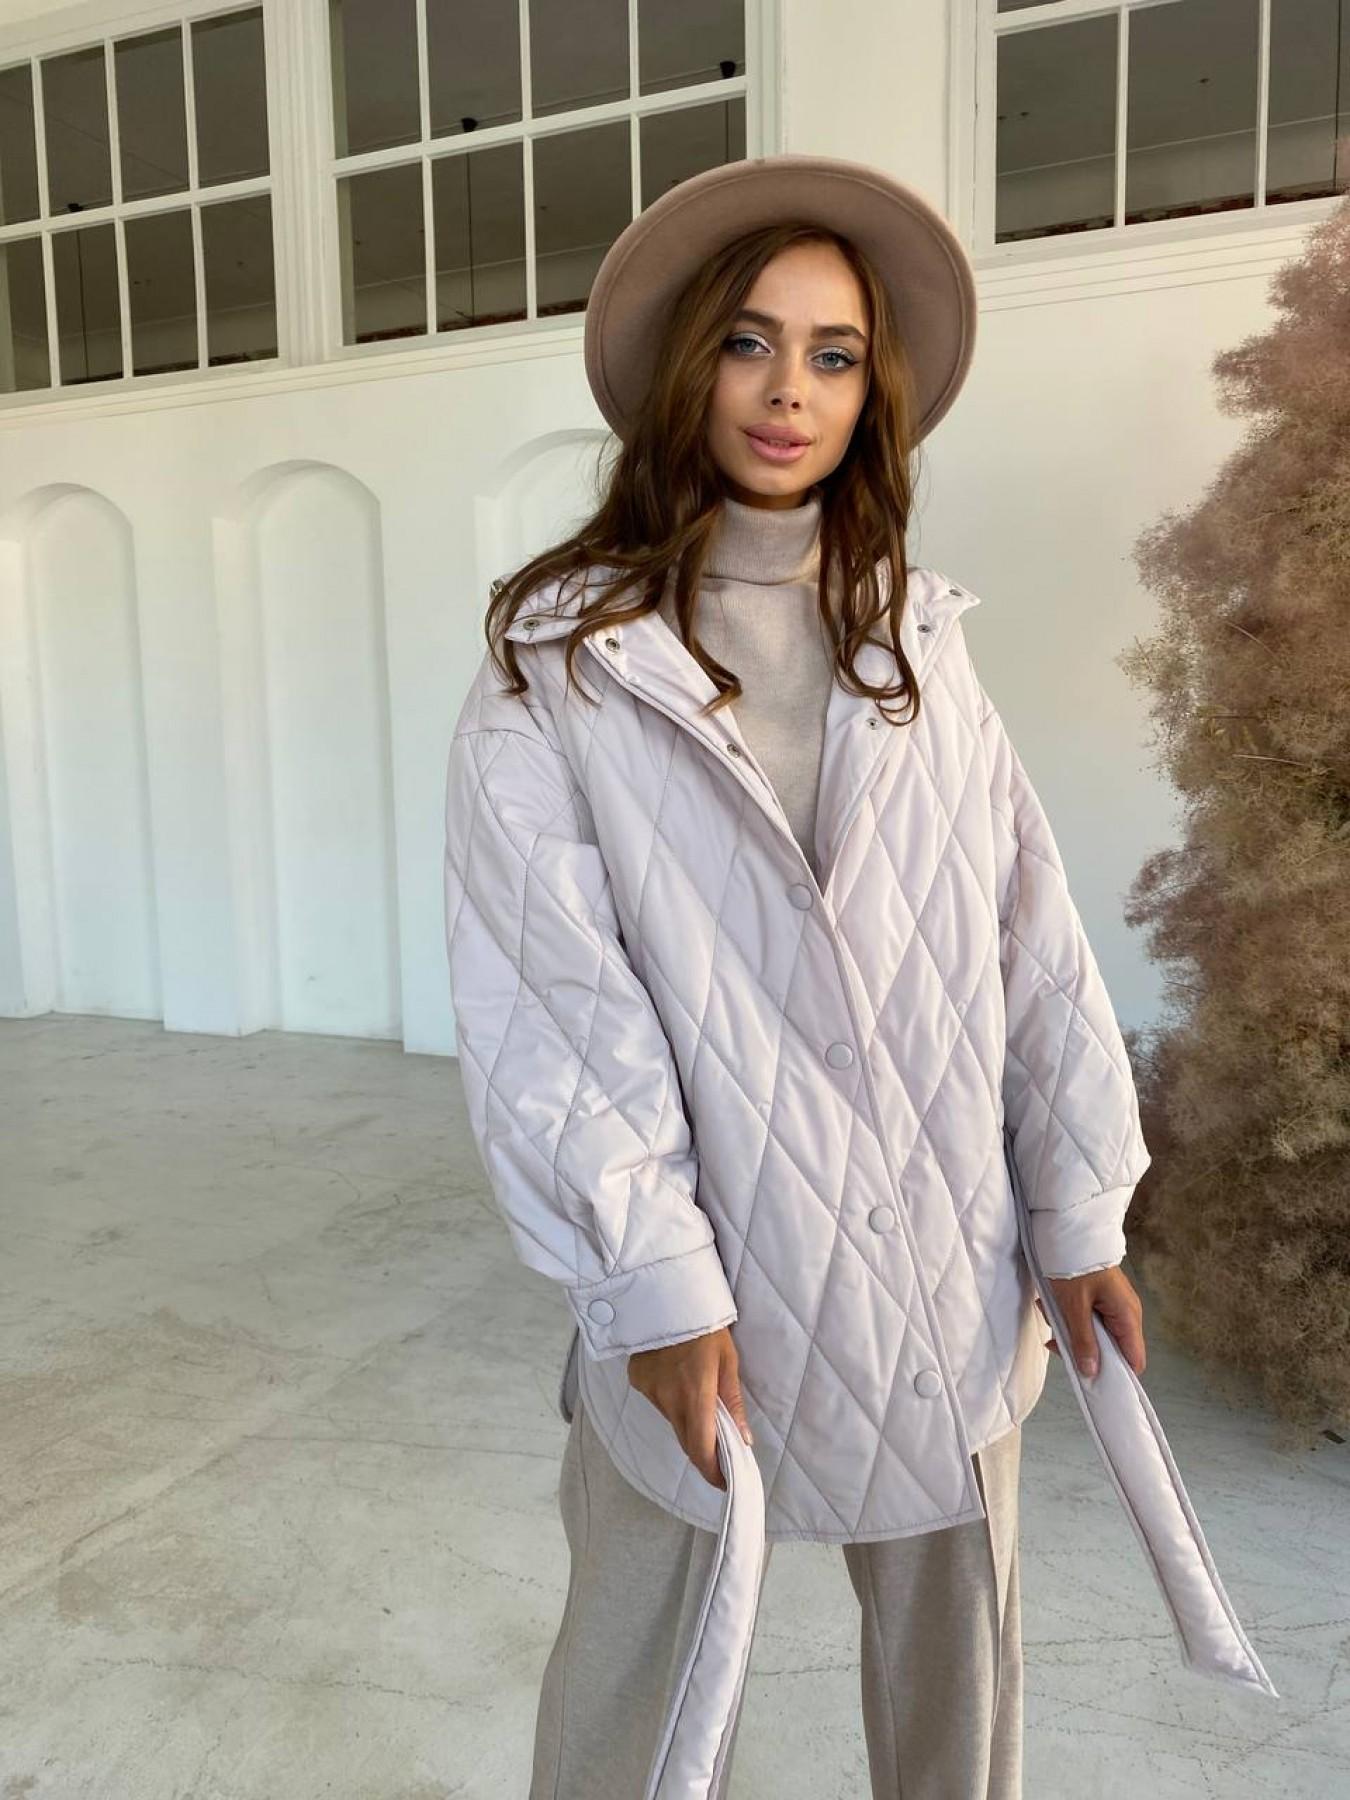 Пазл стеганая куртка из плащевки 10890 АРТ. 47355 Цвет: Бежевый 970 - фото 6, интернет магазин tm-modus.ru